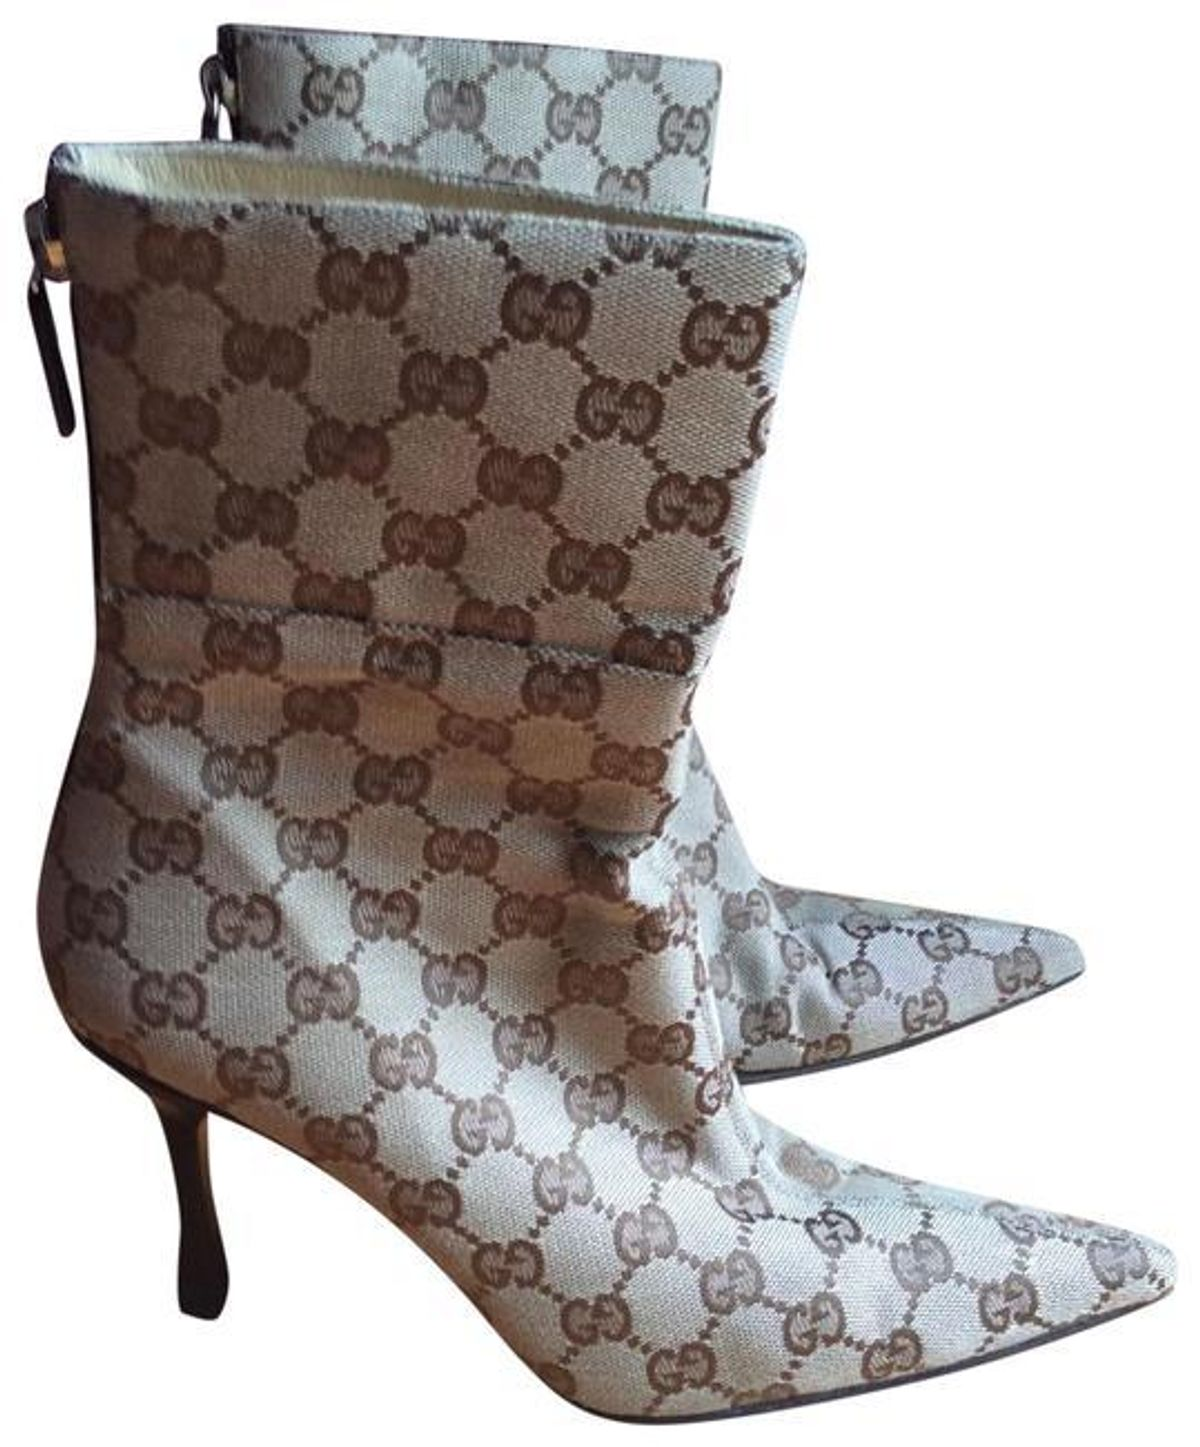 Signature GG Boots